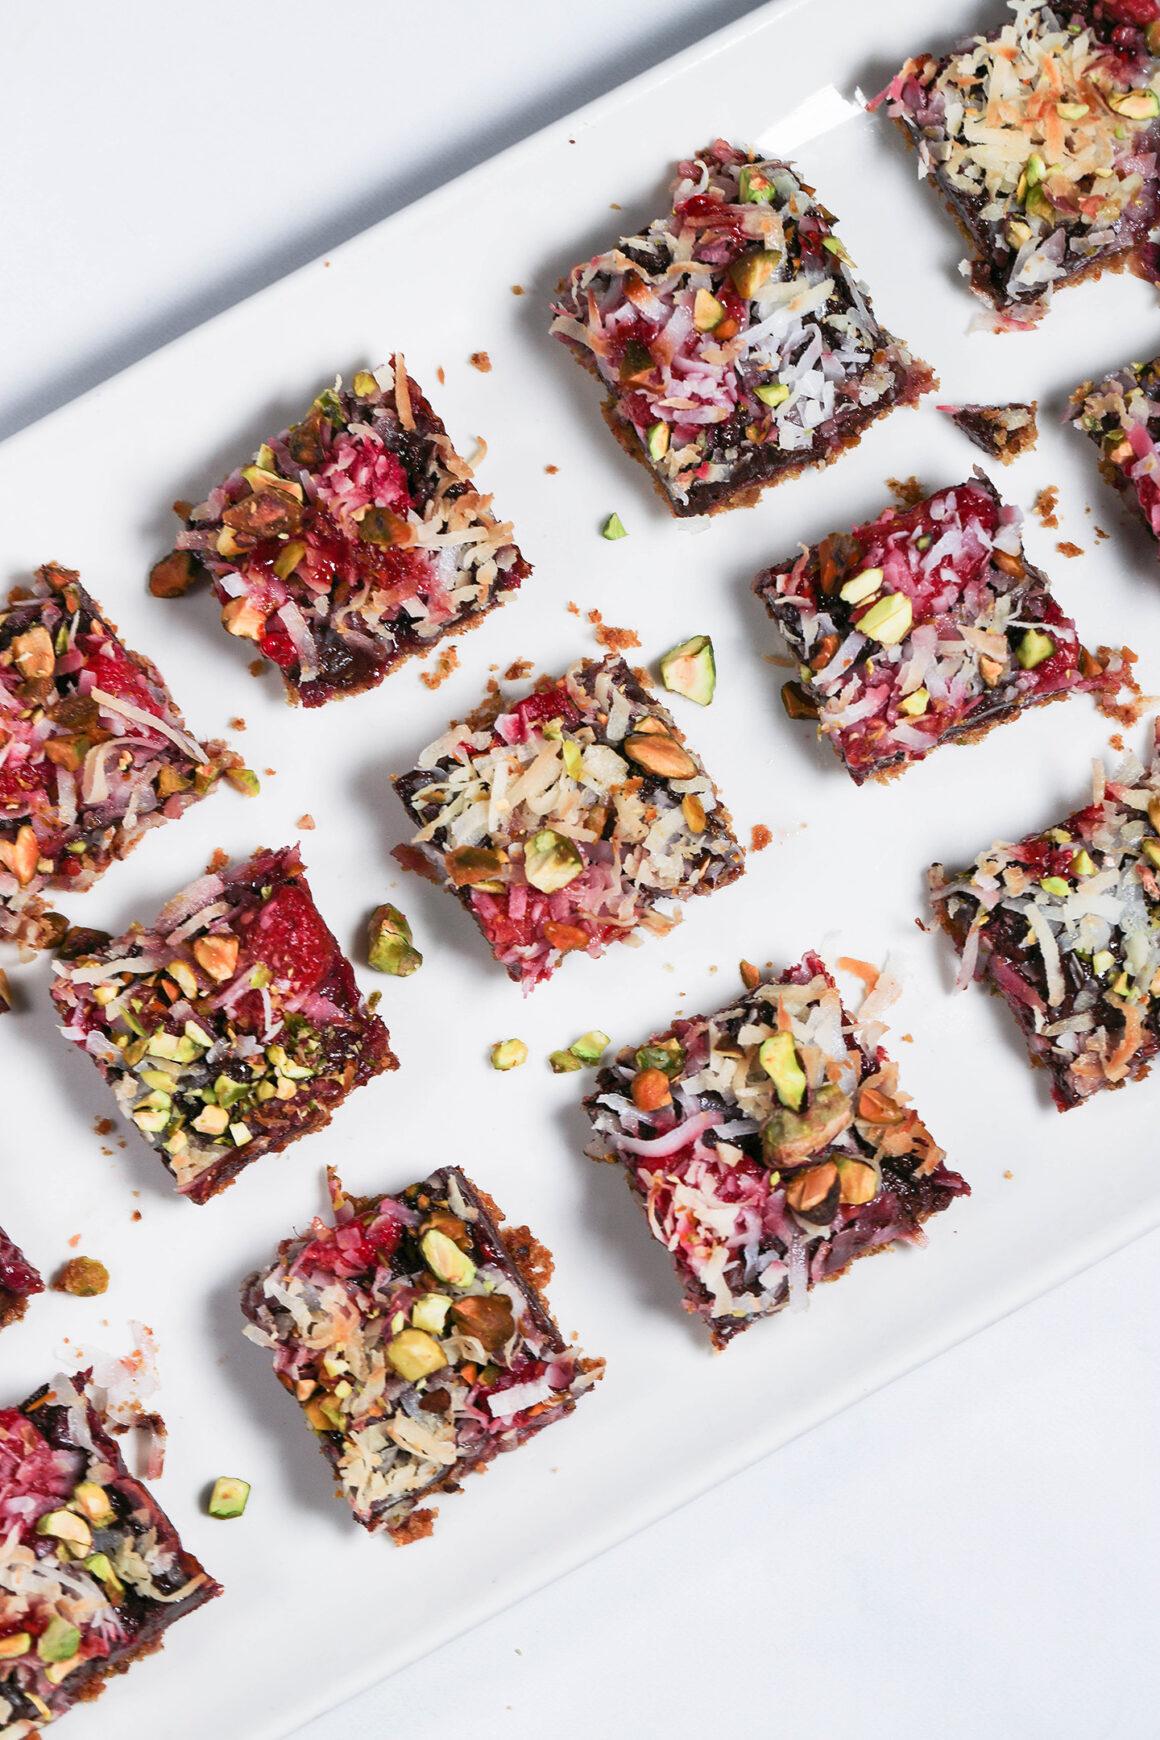 raspberry chocolate bars on platter